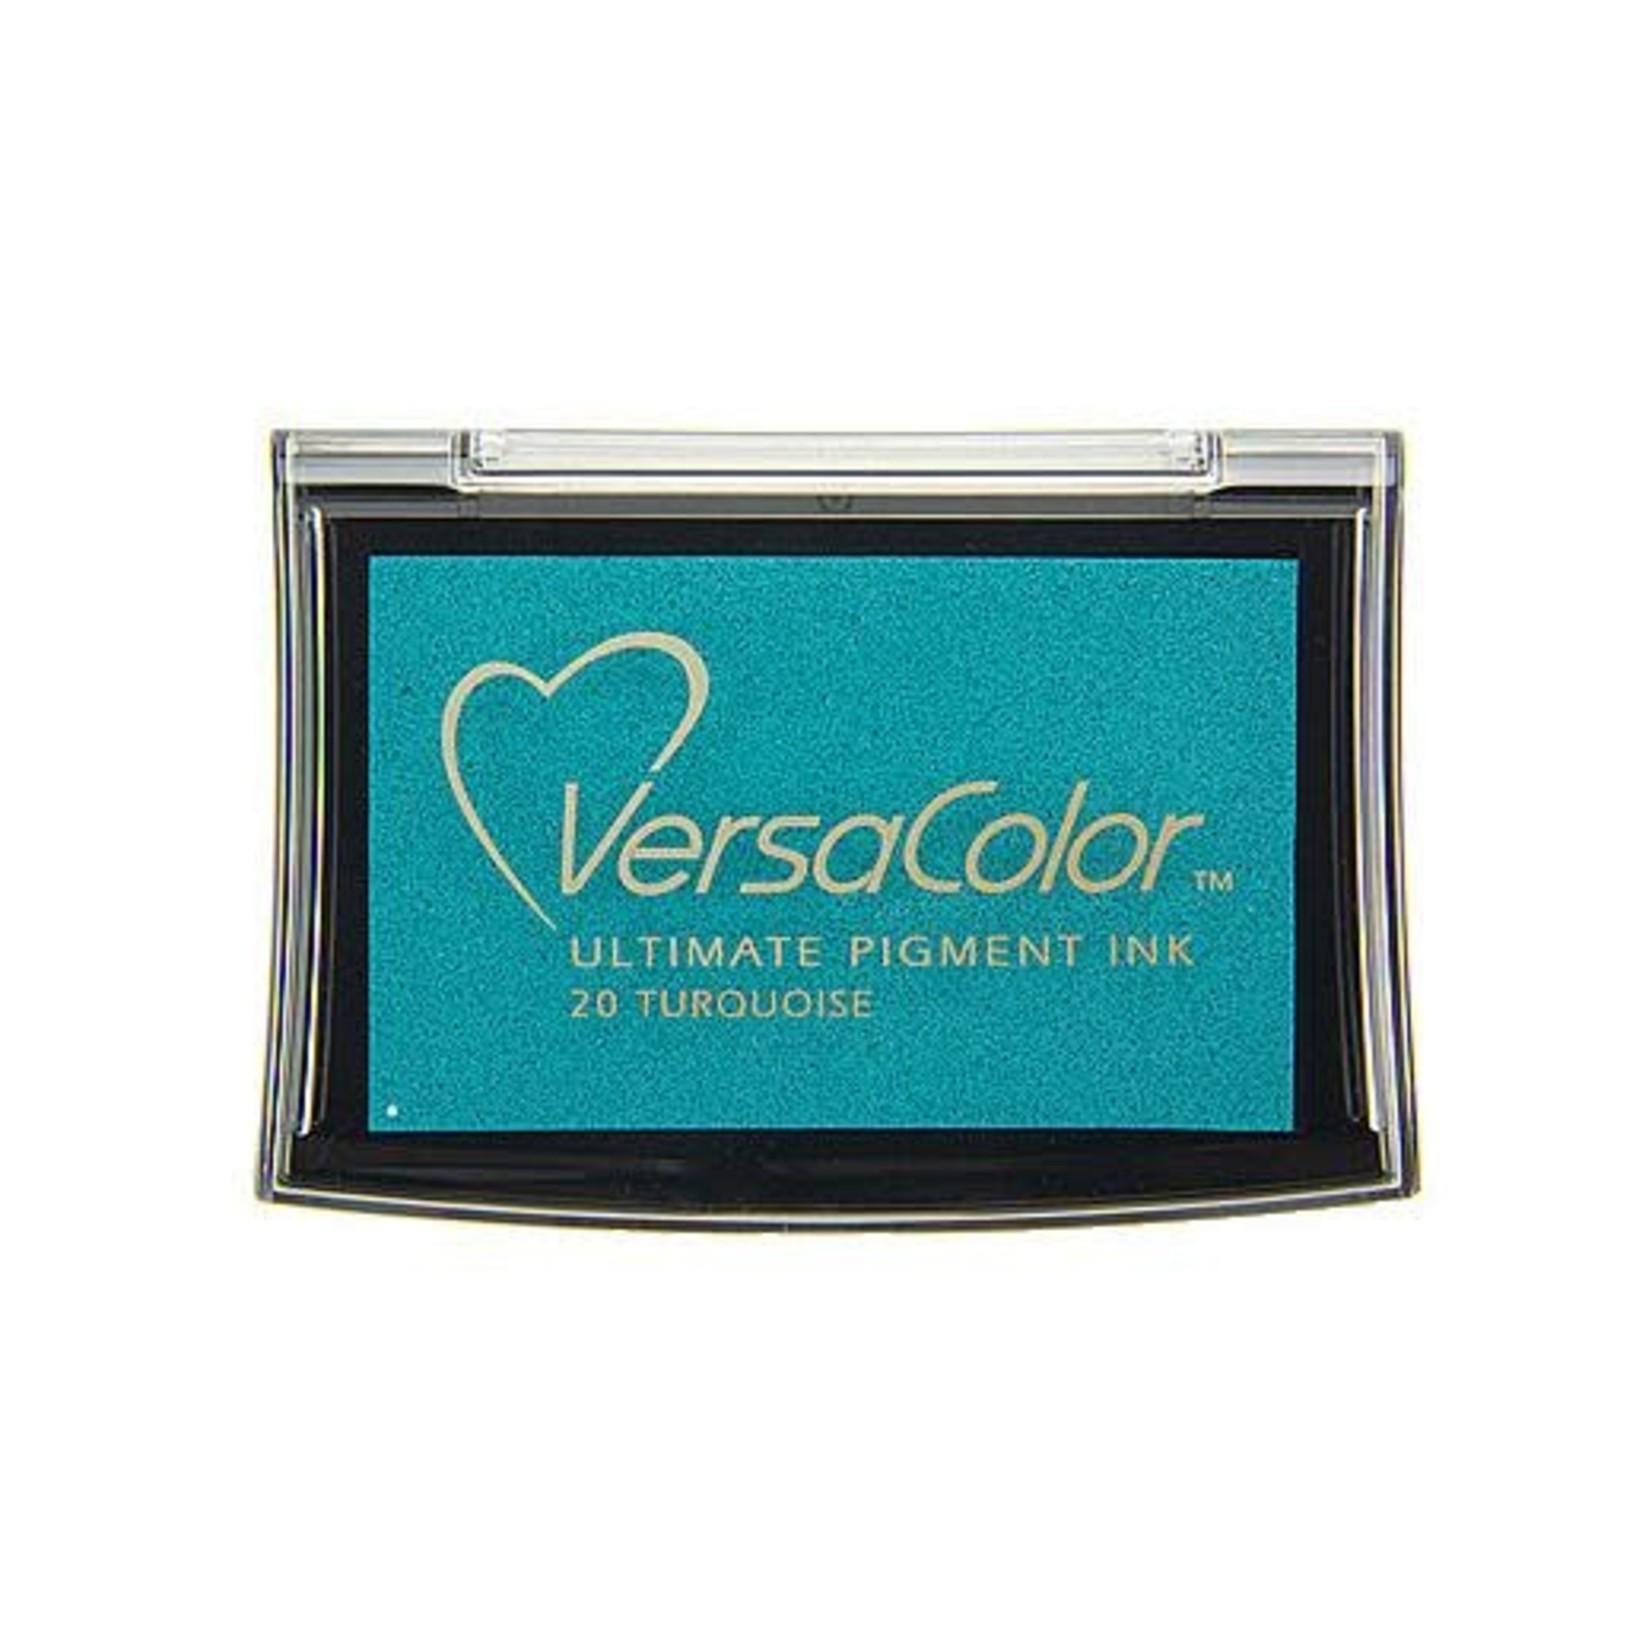 StazOn VersaColor Pigimate Ink Turquoise